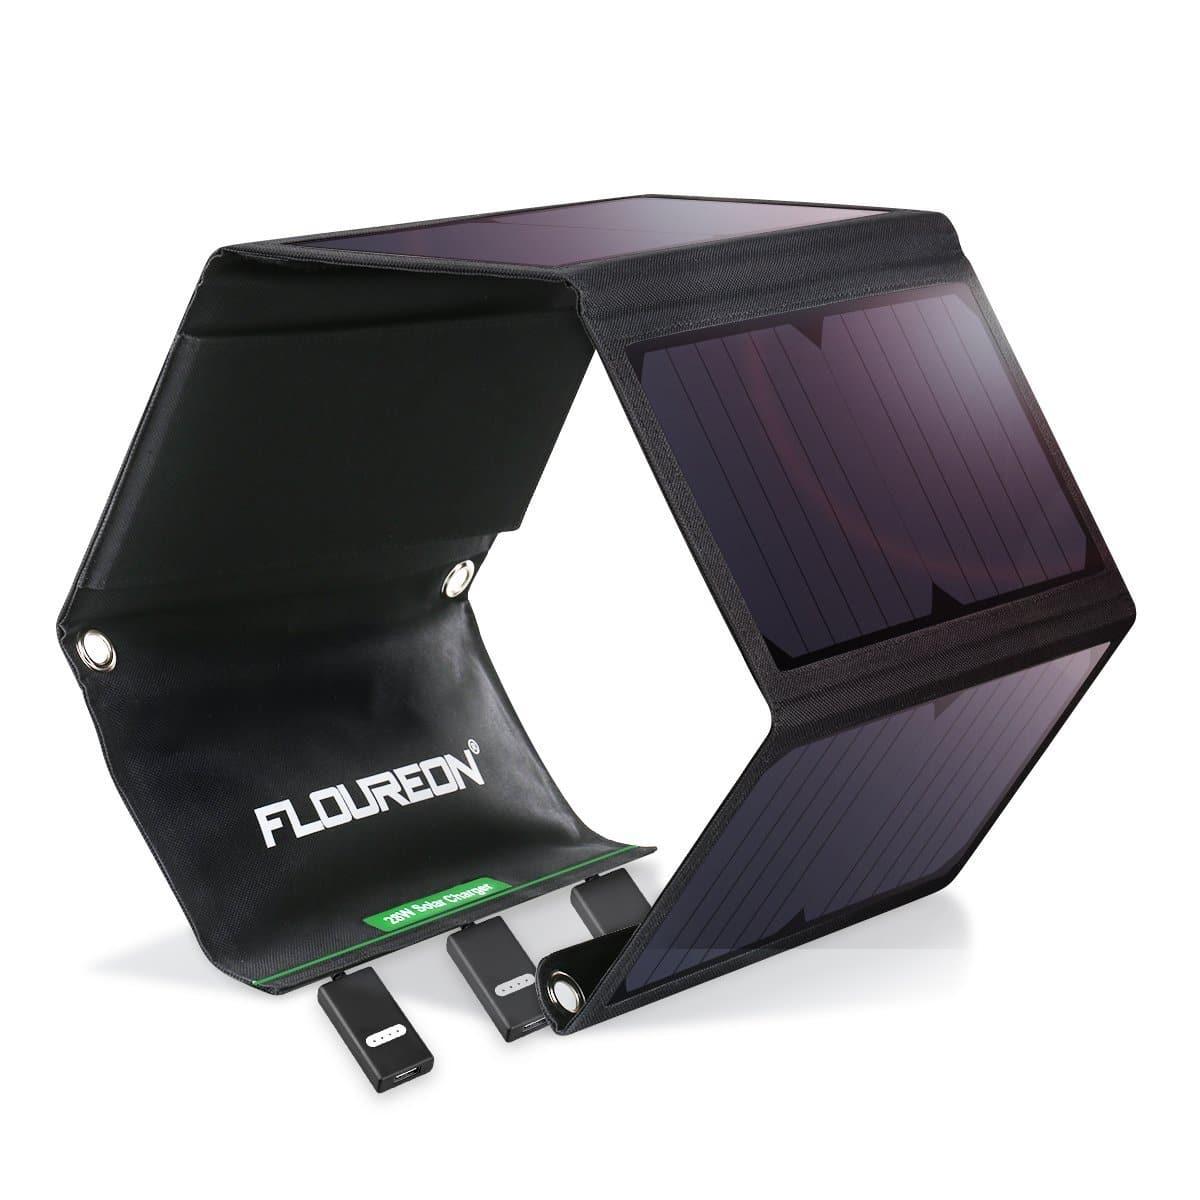 FLOUREON Solar Charger 28W